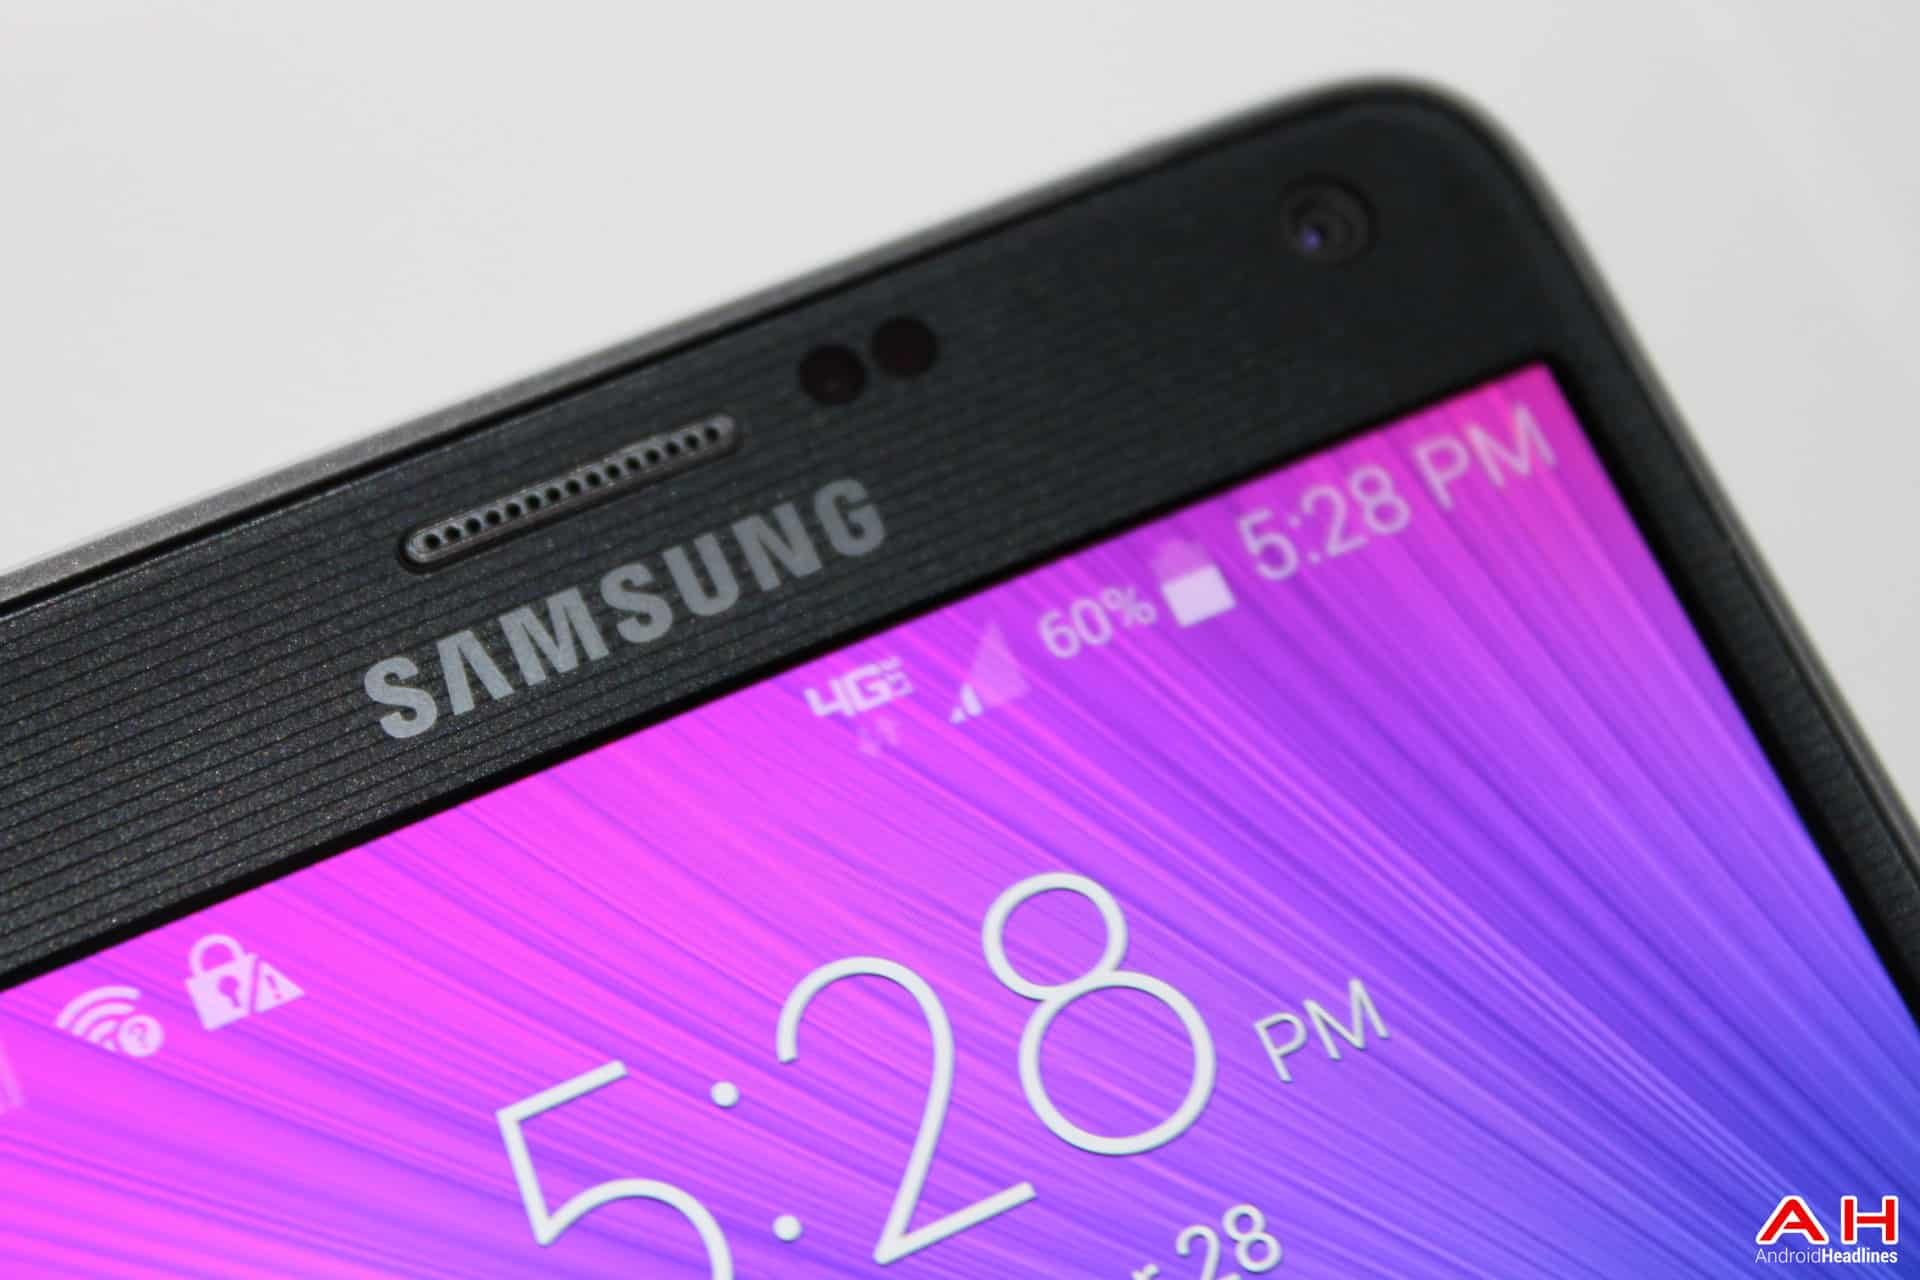 AH Samsung Galaxy Note 4 41